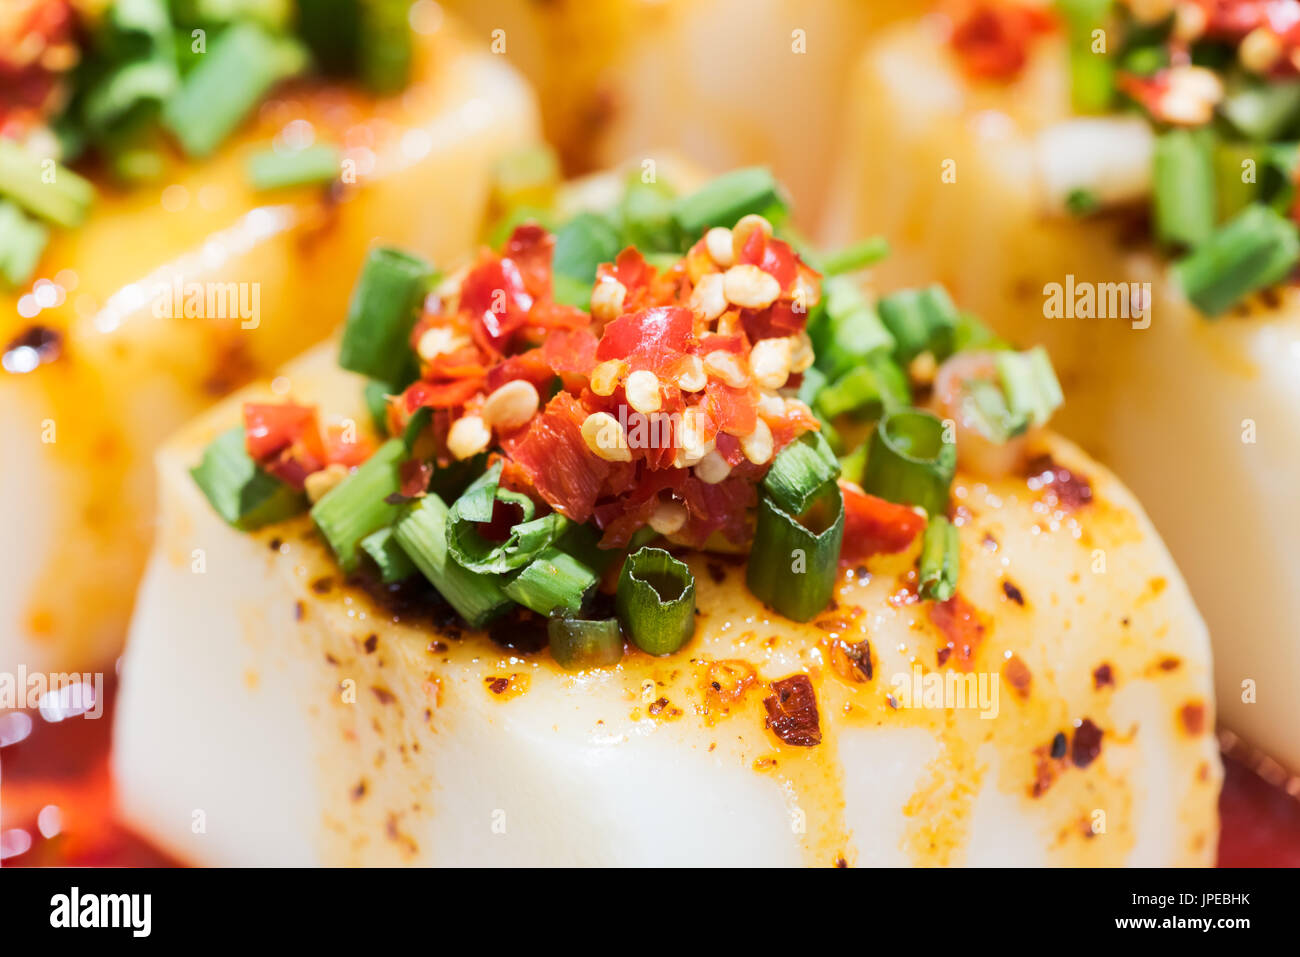 Tofu chino con chili pepper sauce - comida china. Imagen De Stock